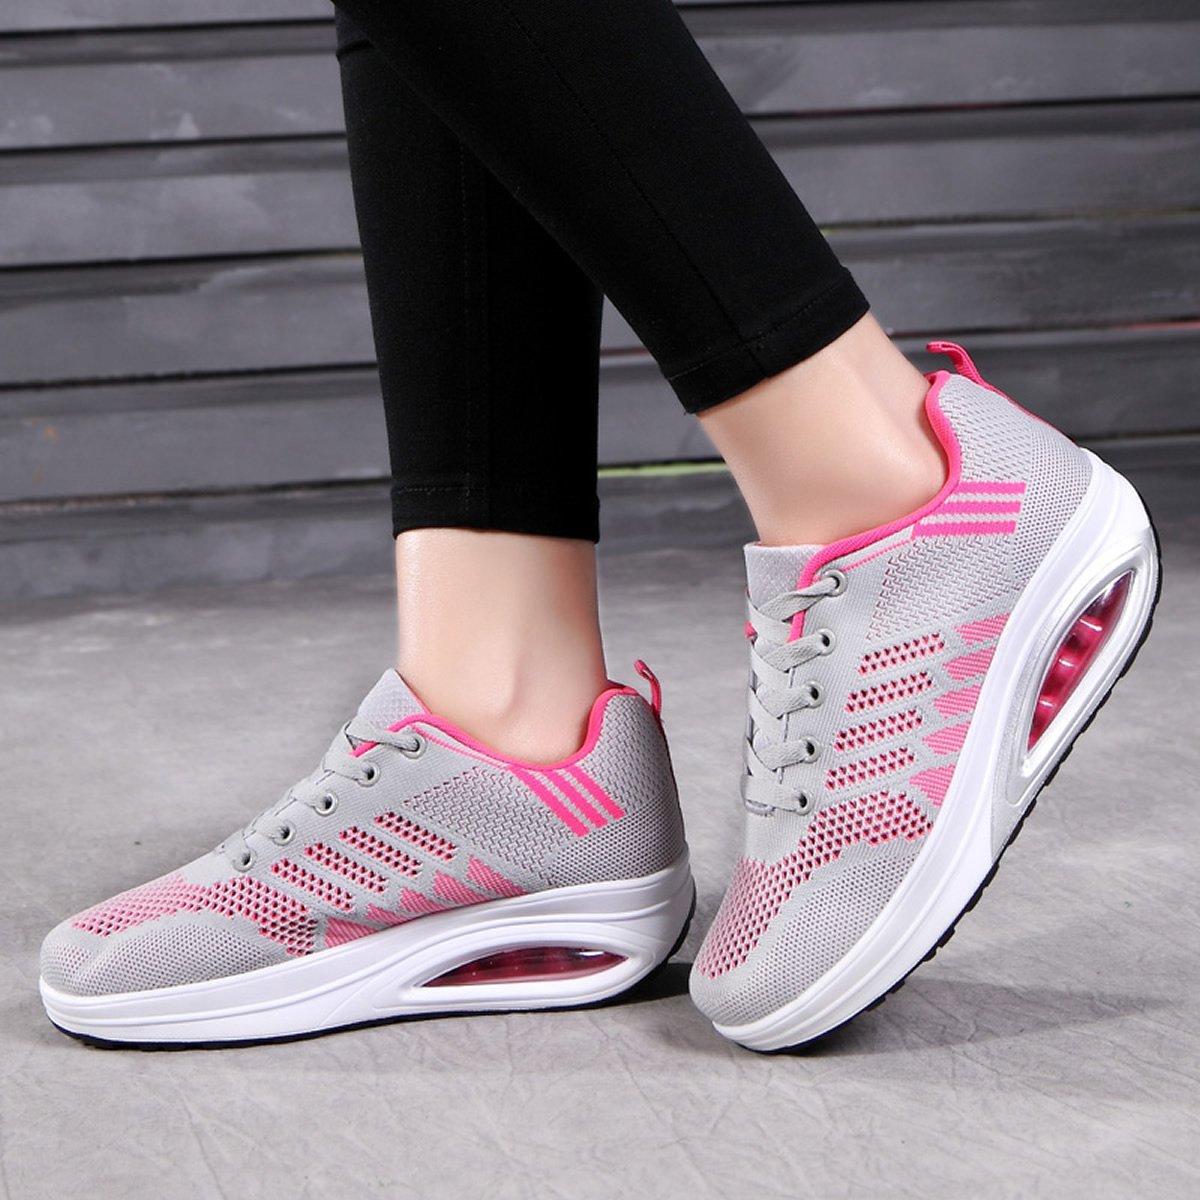 JARLIF Women's Comfortable Platform Walking Sneakers Lightweight Casual Tennis Air Fitness Shoes US5.5-10 B0713N13JJ 5.5 B(M) Women / 5 D(M) Men / EU 36|Gray